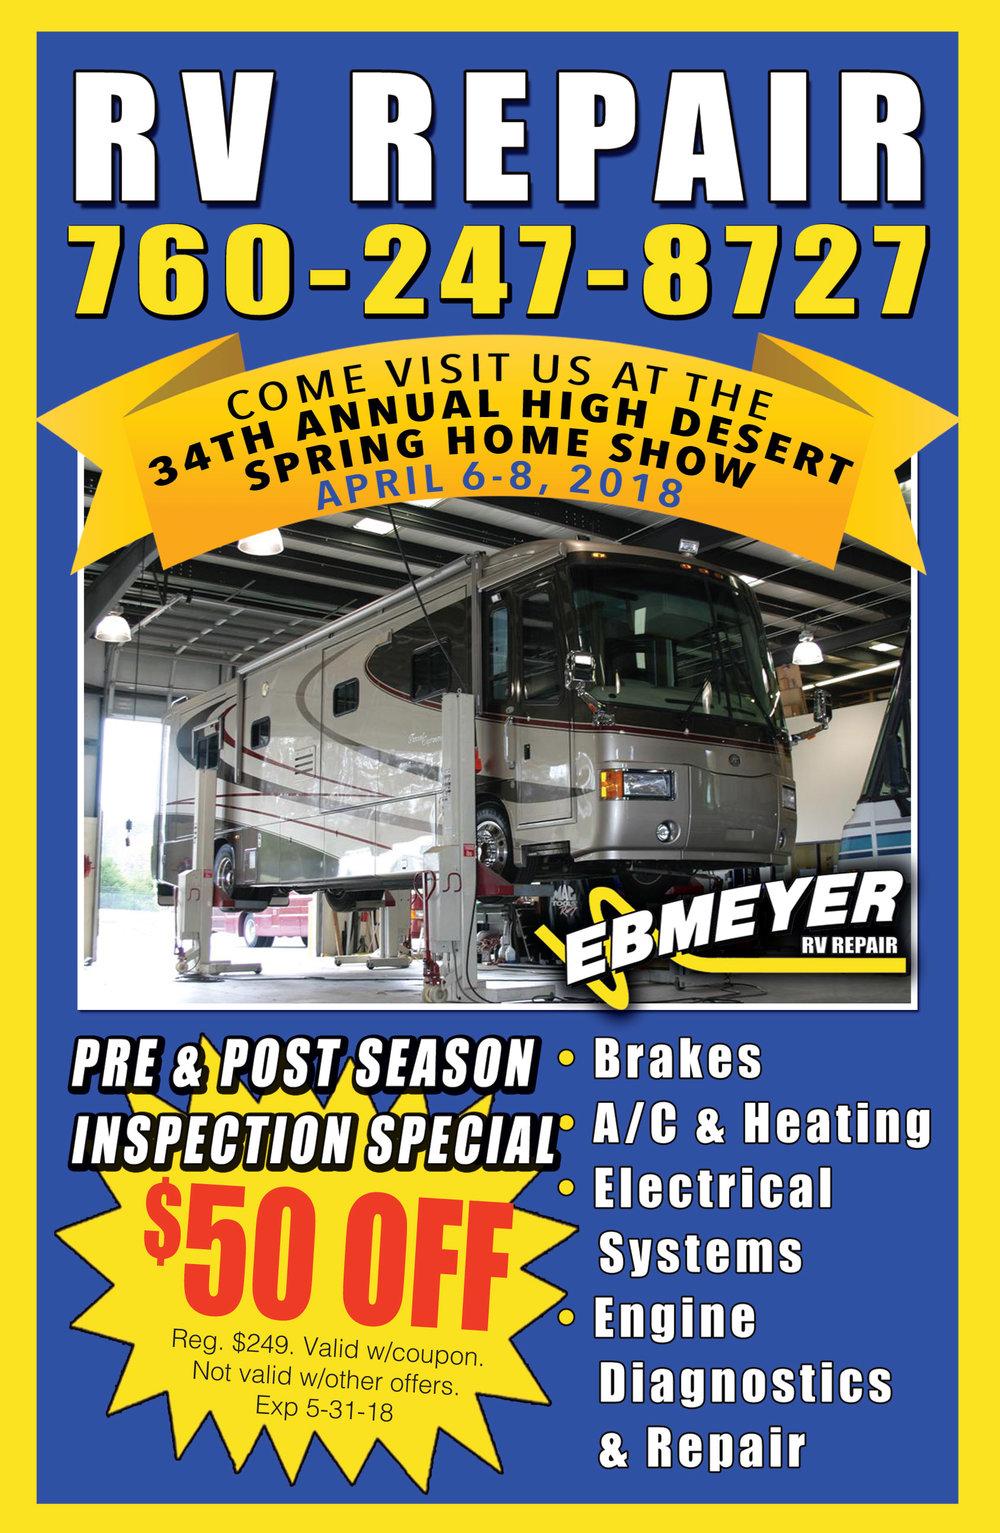 Eb Meyer RV Repair.jpg